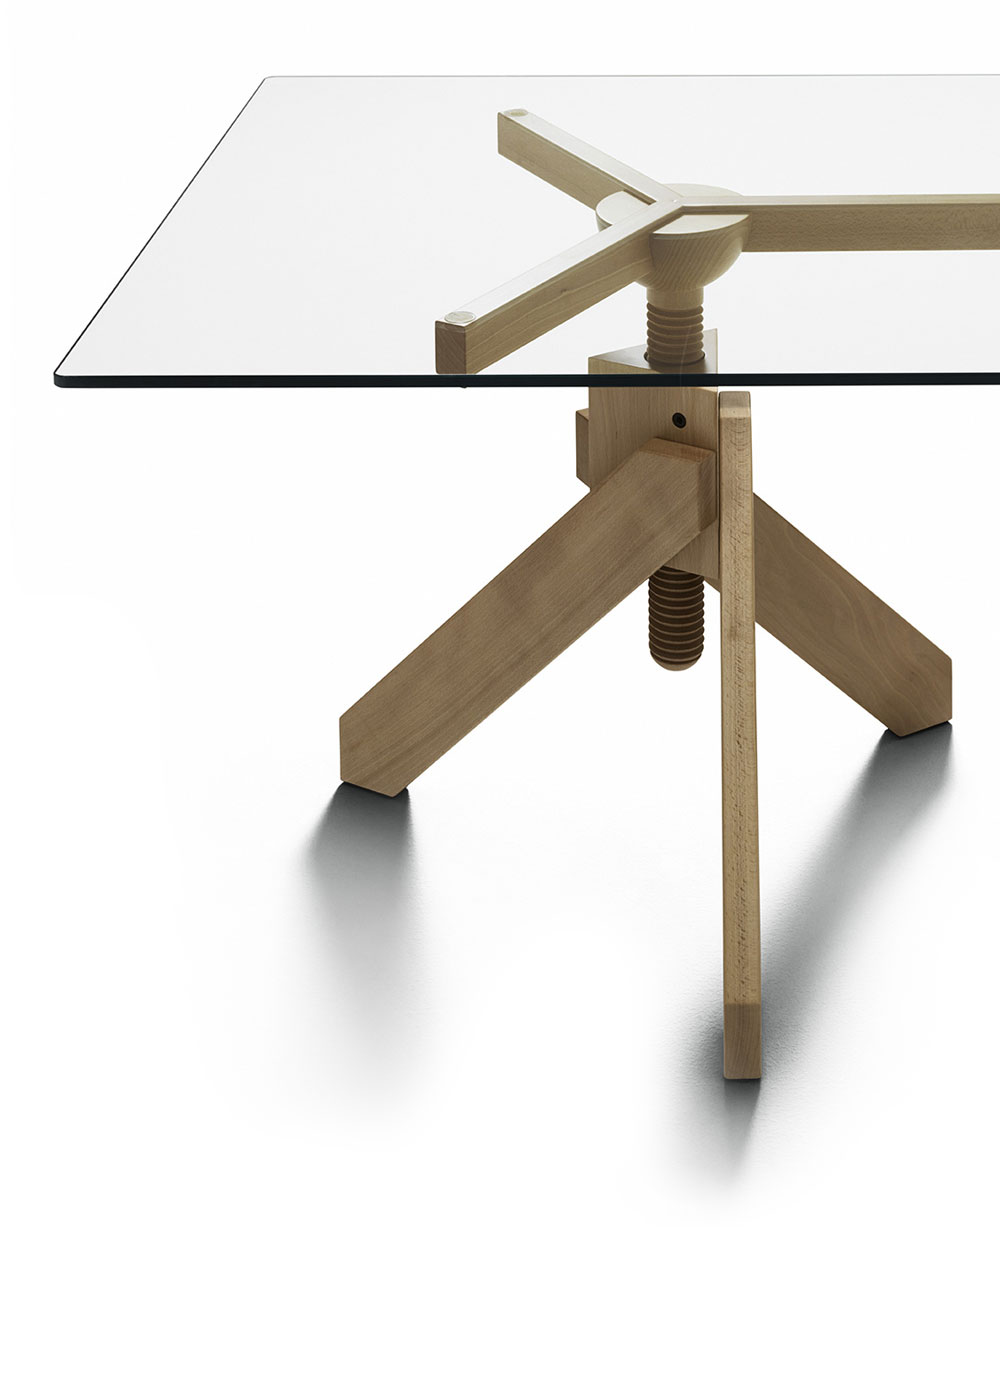 20160401-1571-depadova-tavoli-vidun-intro.jpg